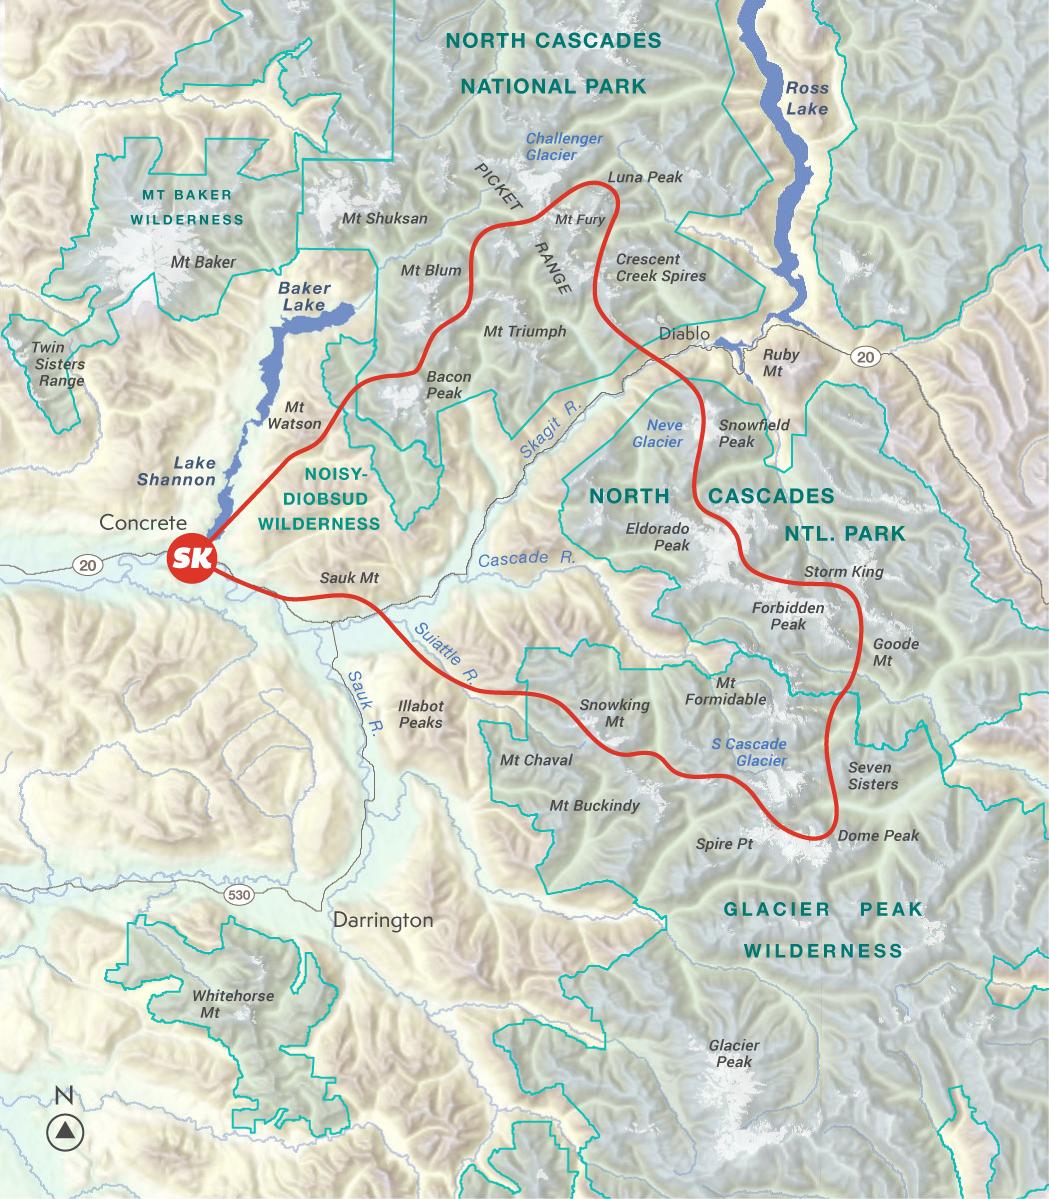 North Cascades Explorer Scenic Flight Map